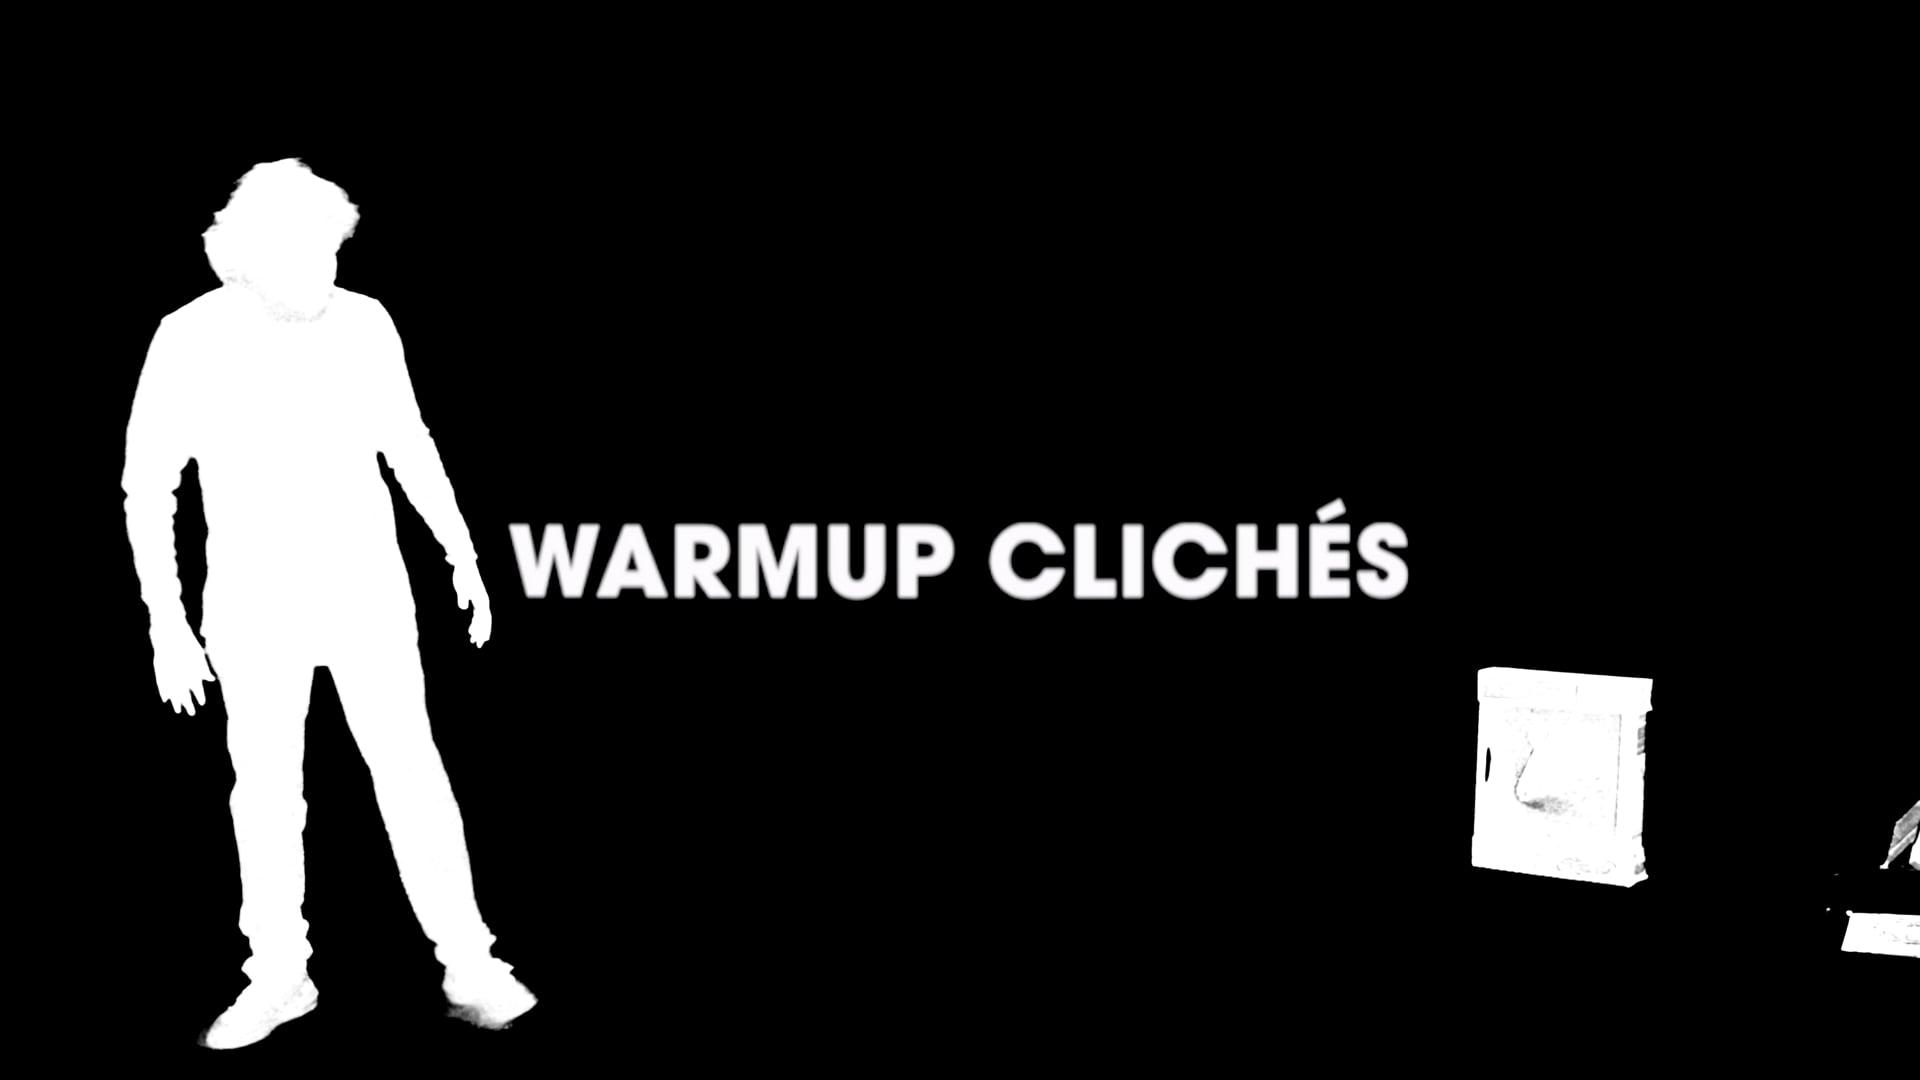 WARMUP CLICHÉS